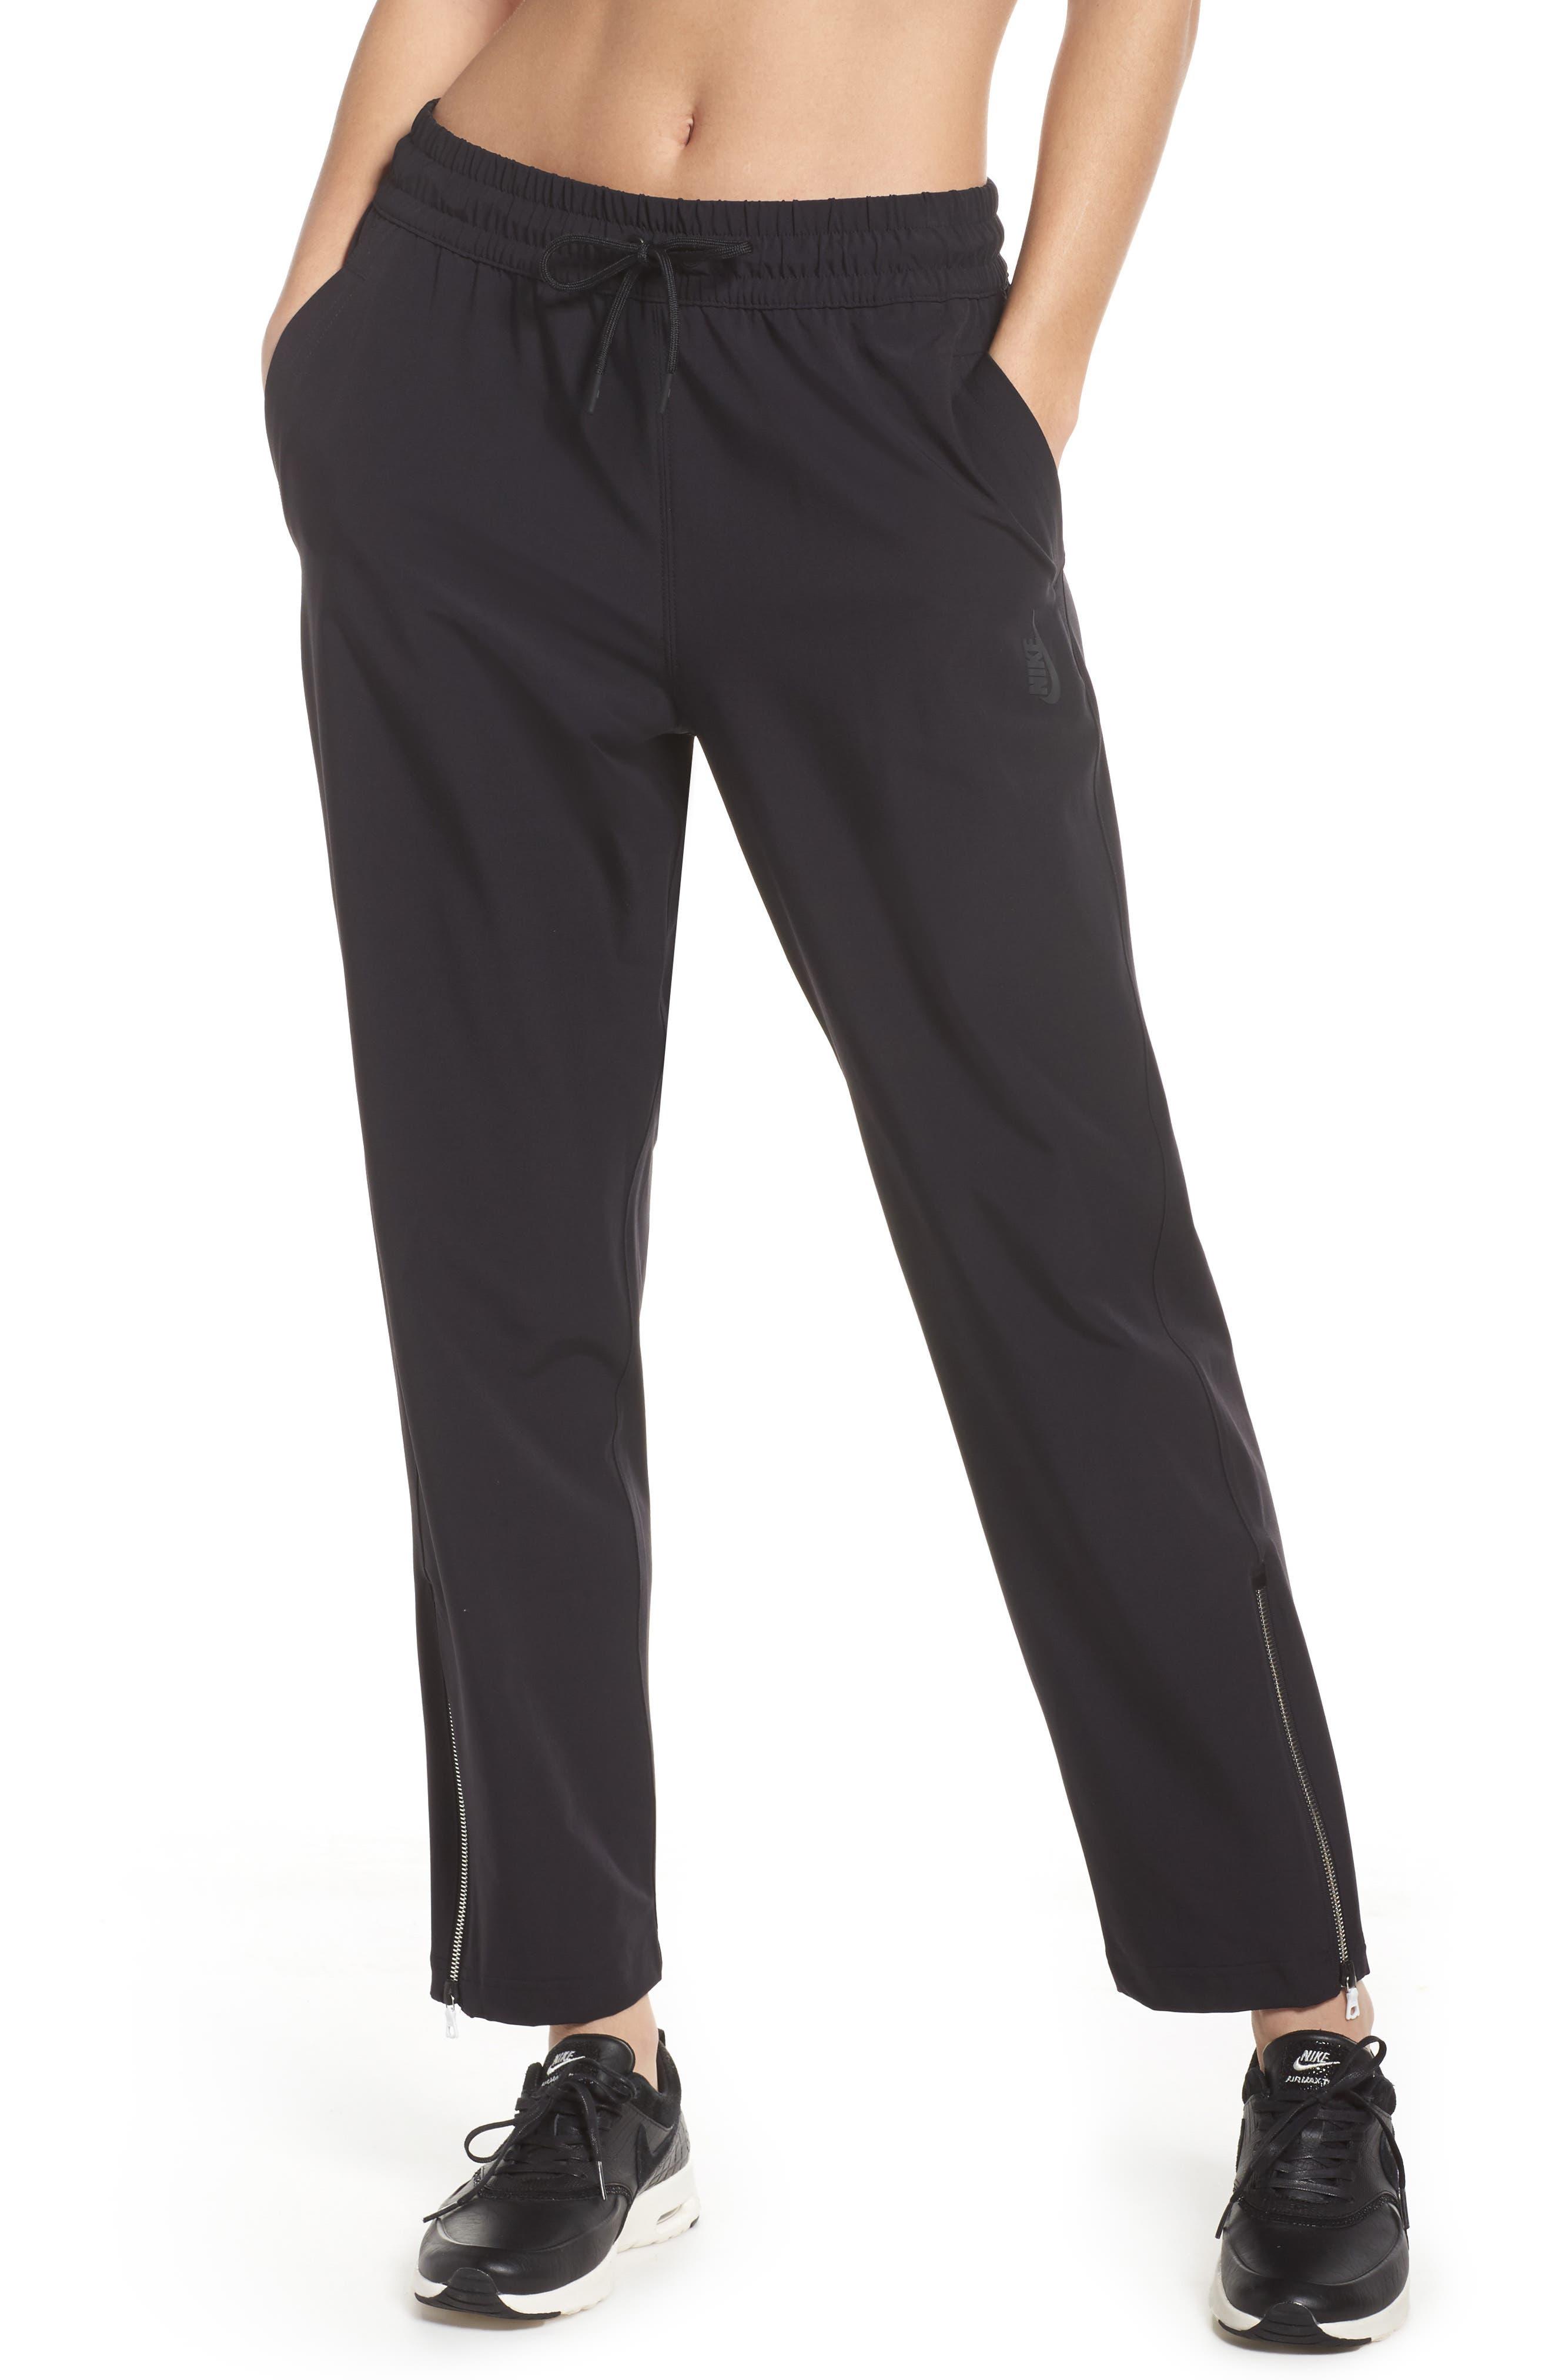 NikeLab Stretch Woven Training Pants,                         Main,                         color, Black/ Black